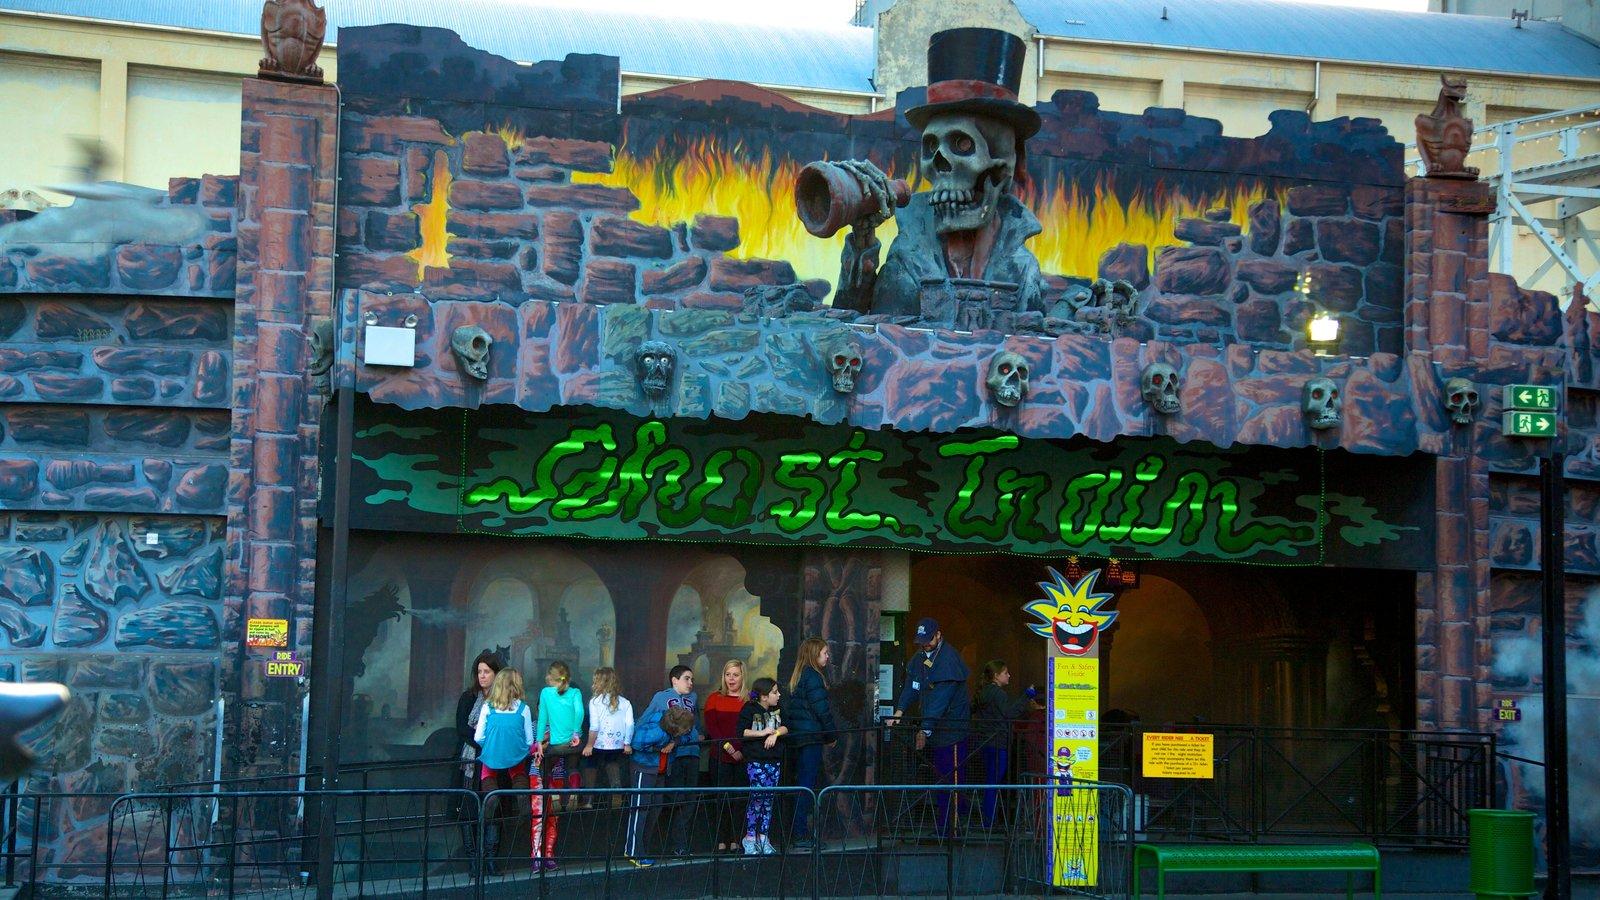 Luna Park showing art, rides and signage